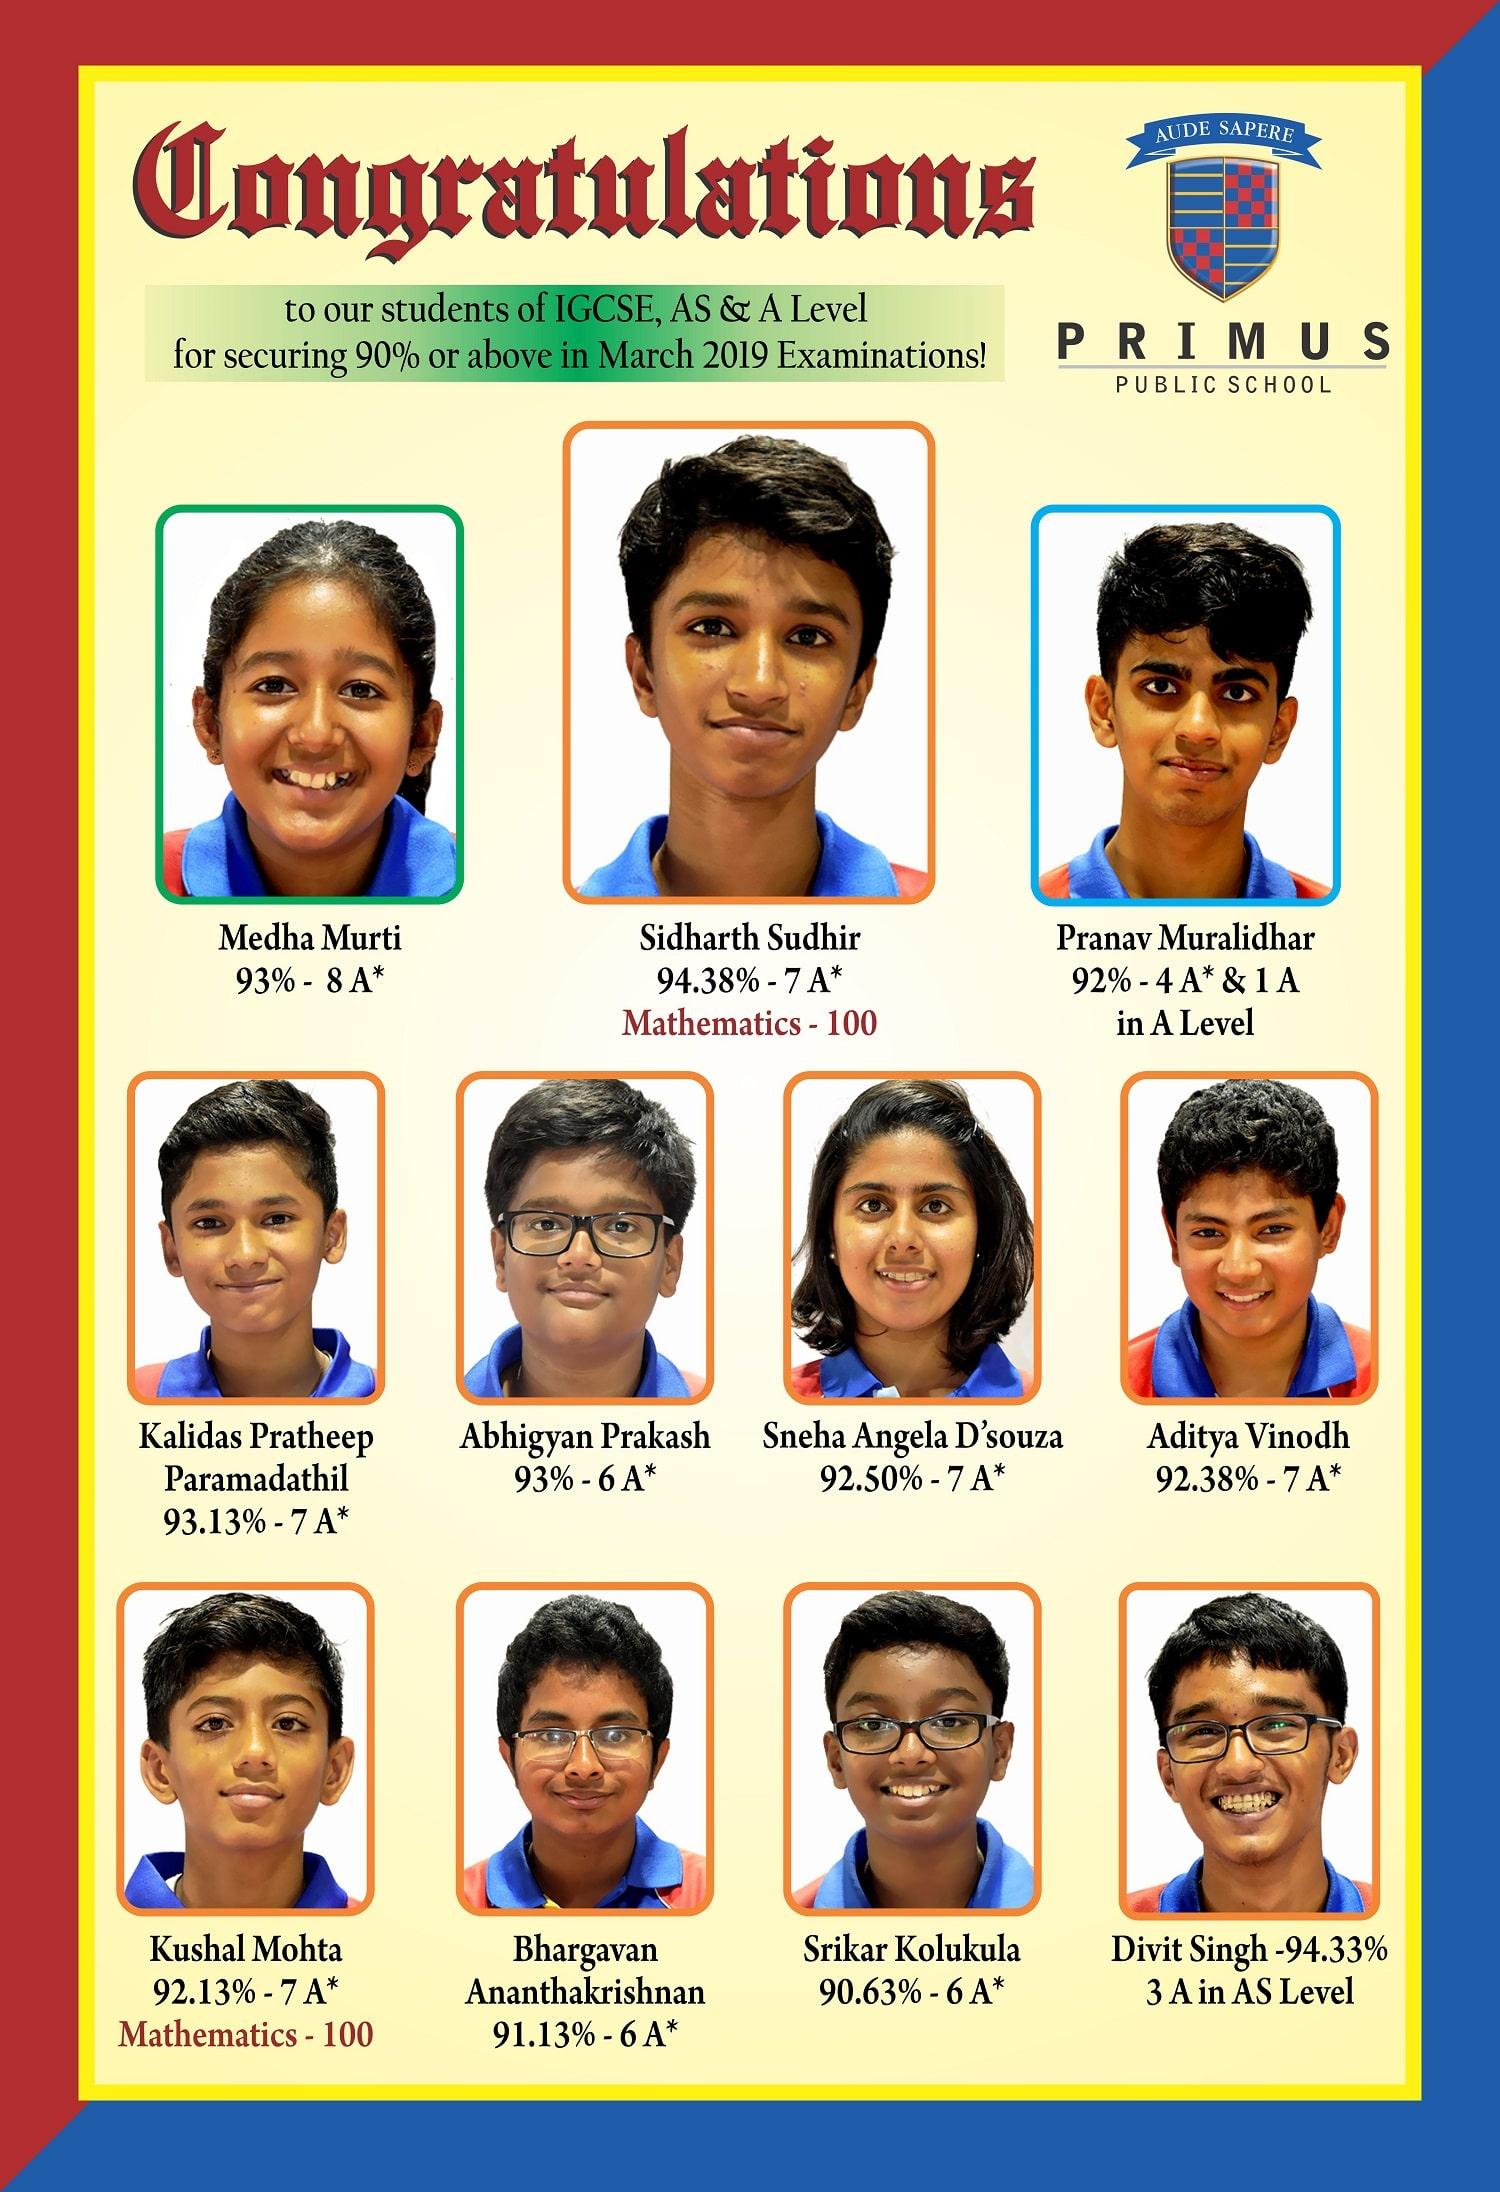 CAIE Results | PRIMUS PUBLIC SCHOOL